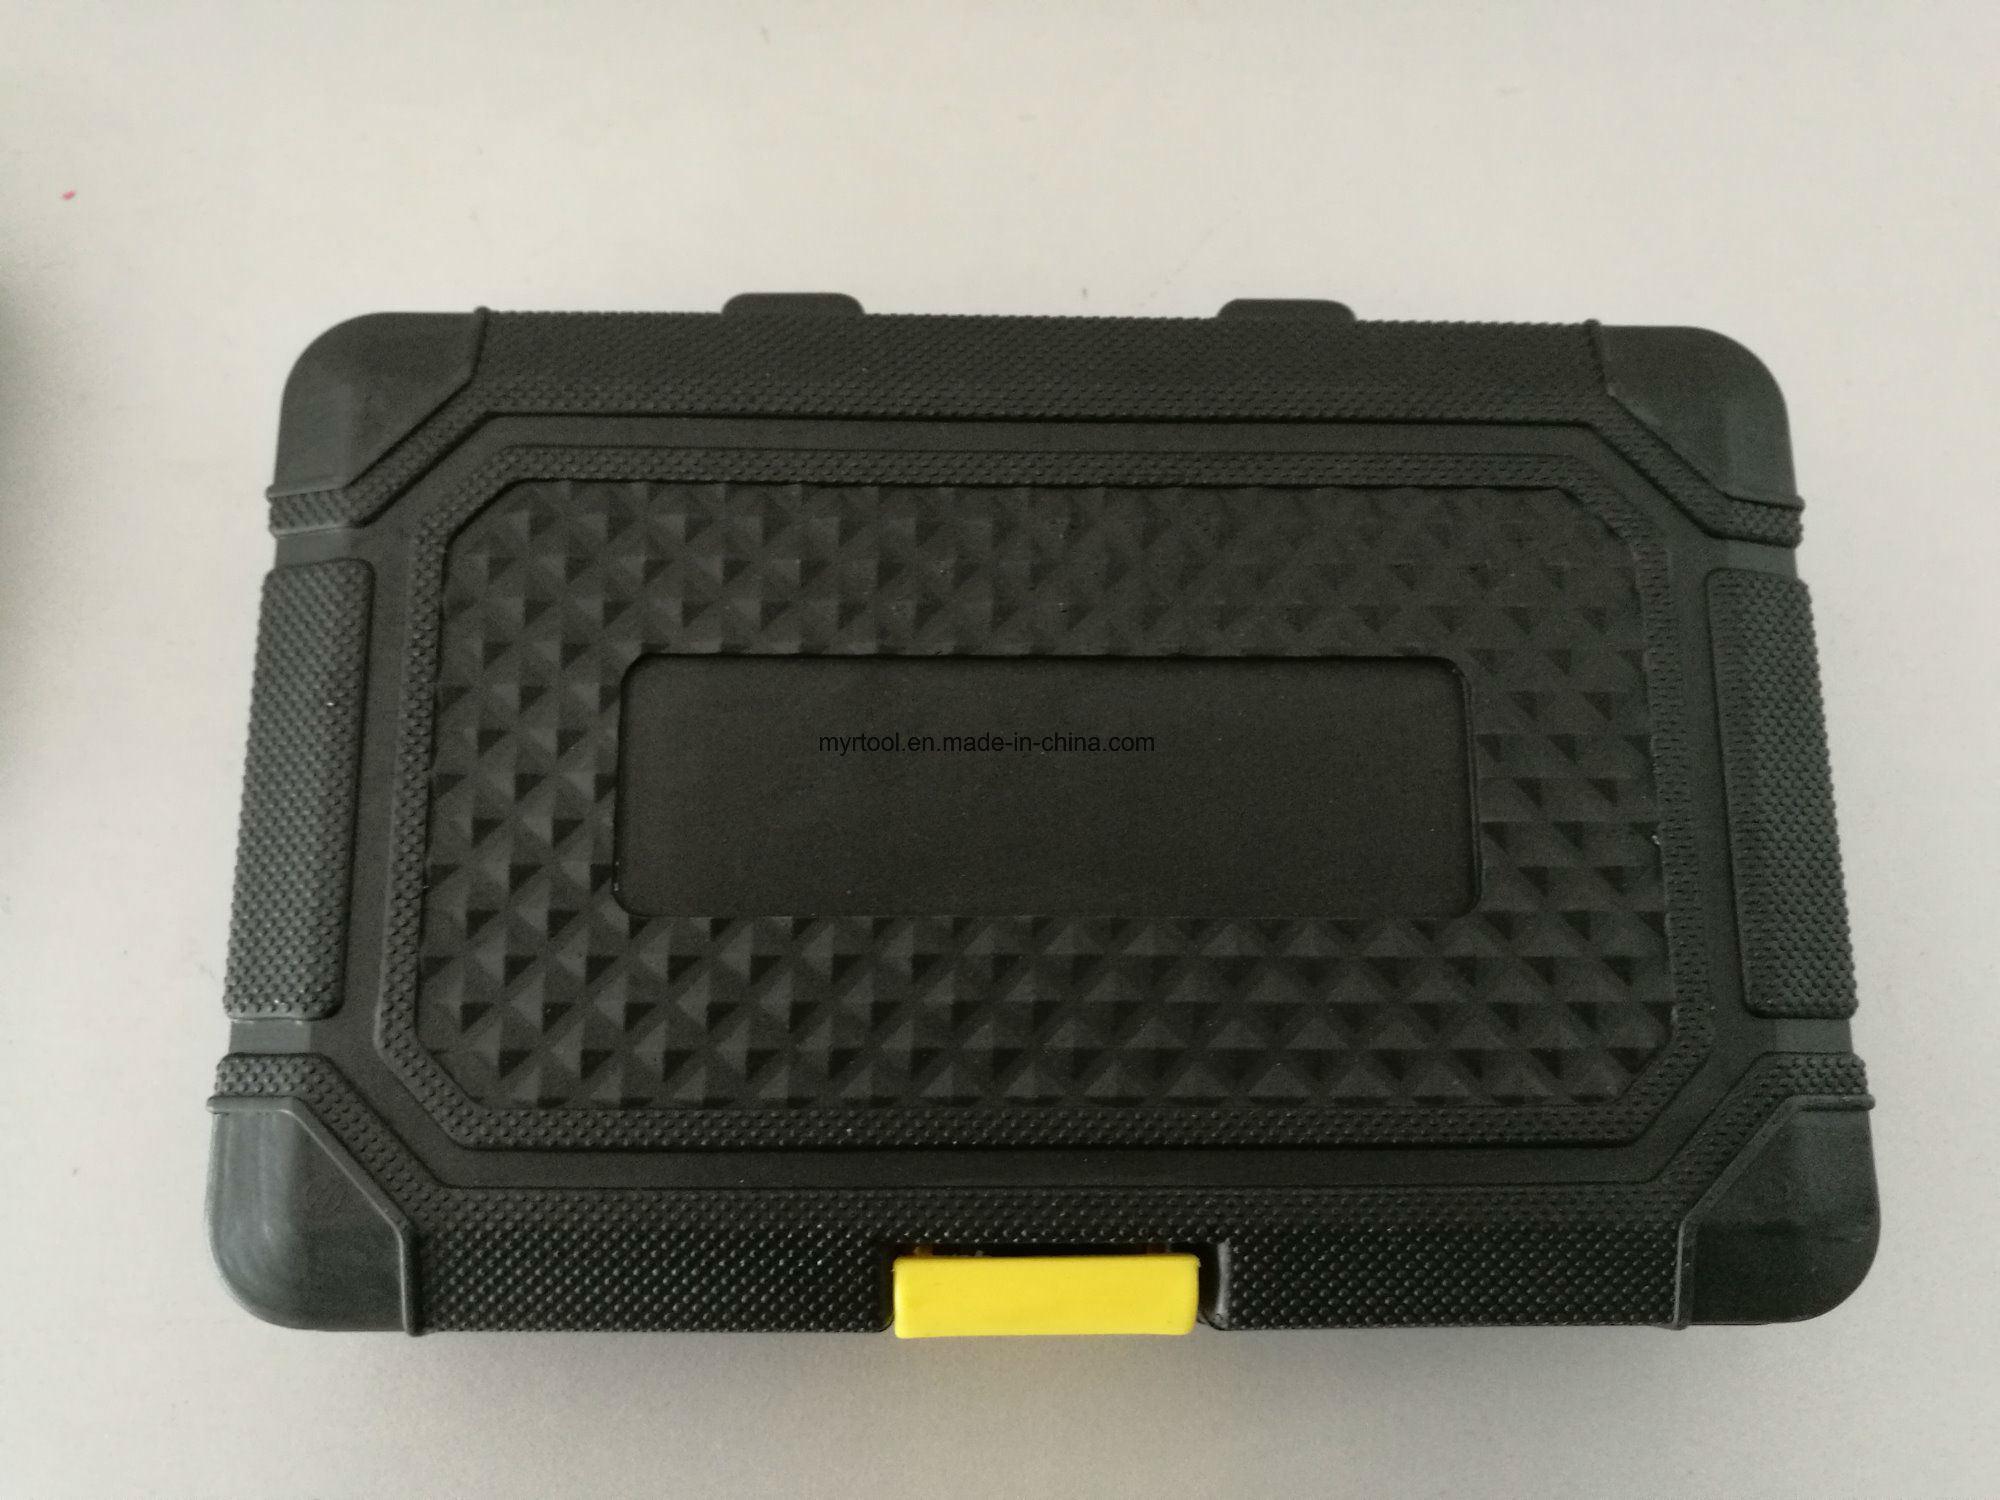 "46PCS 1/4""Dr Socket Set in Blowing Case (FY1046B1)"